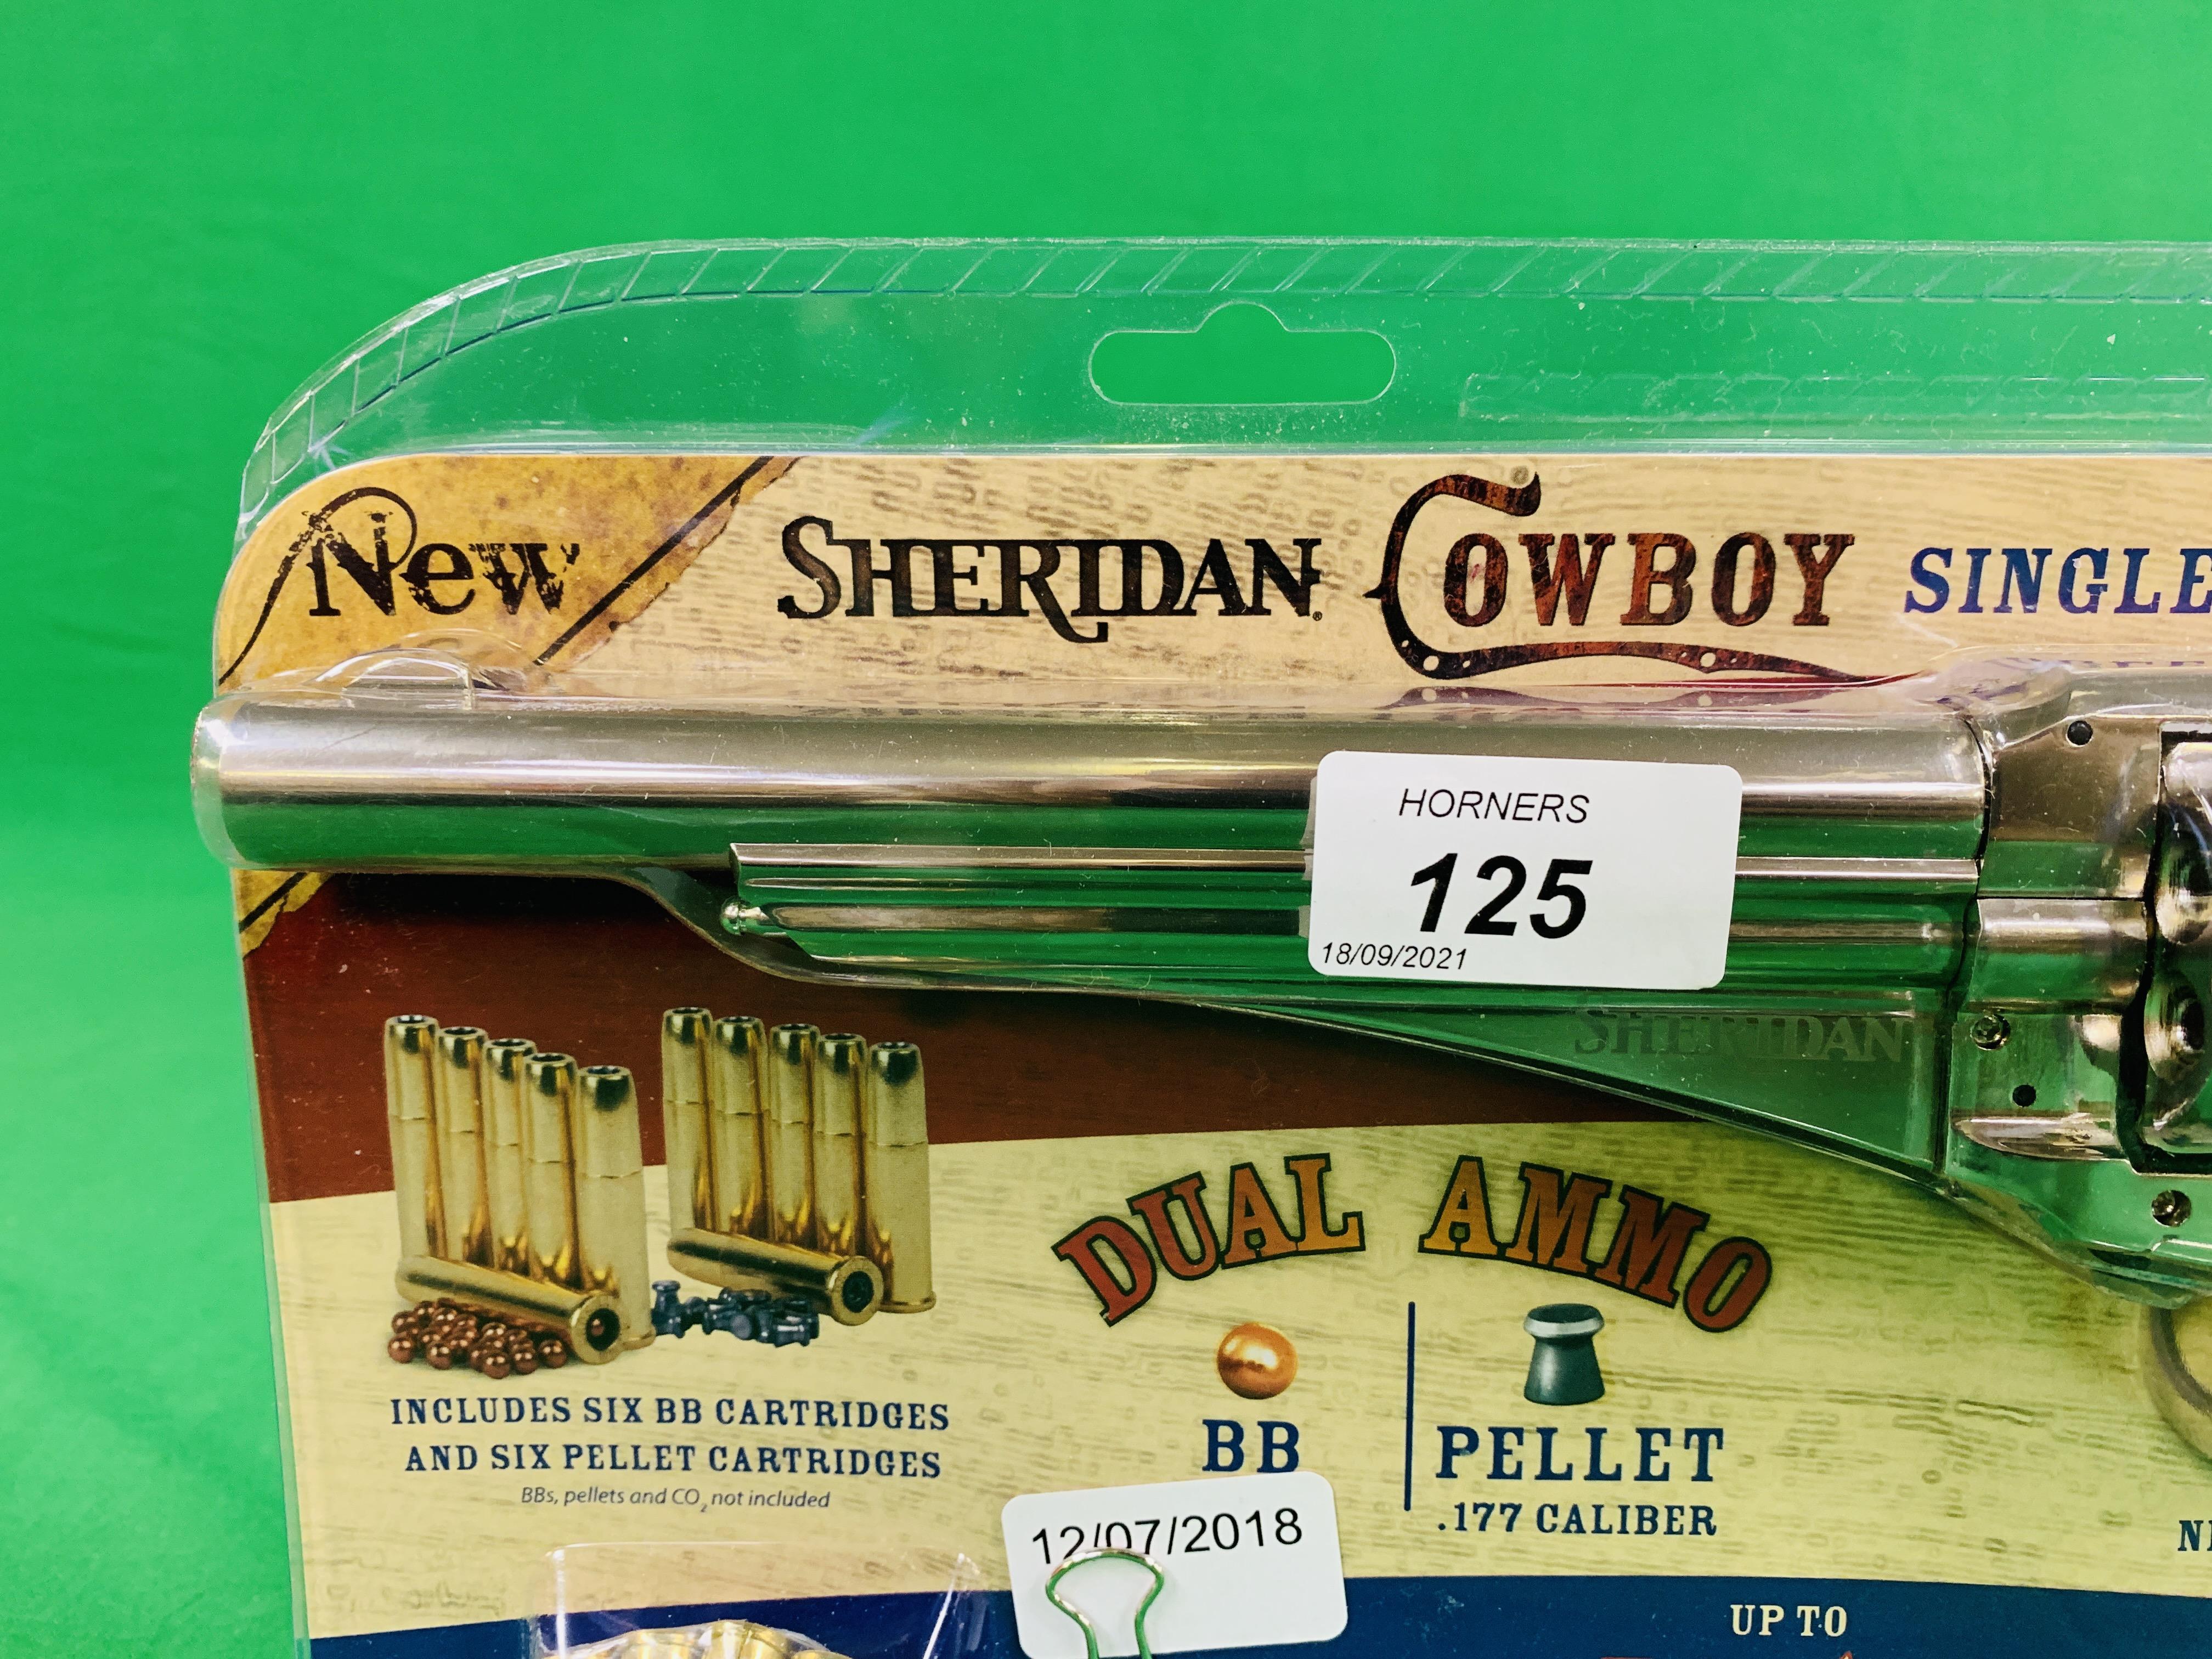 A SHERIDAN COWBOY SINGLE ACTION BB / PELLET REVOLVER . - Image 3 of 6